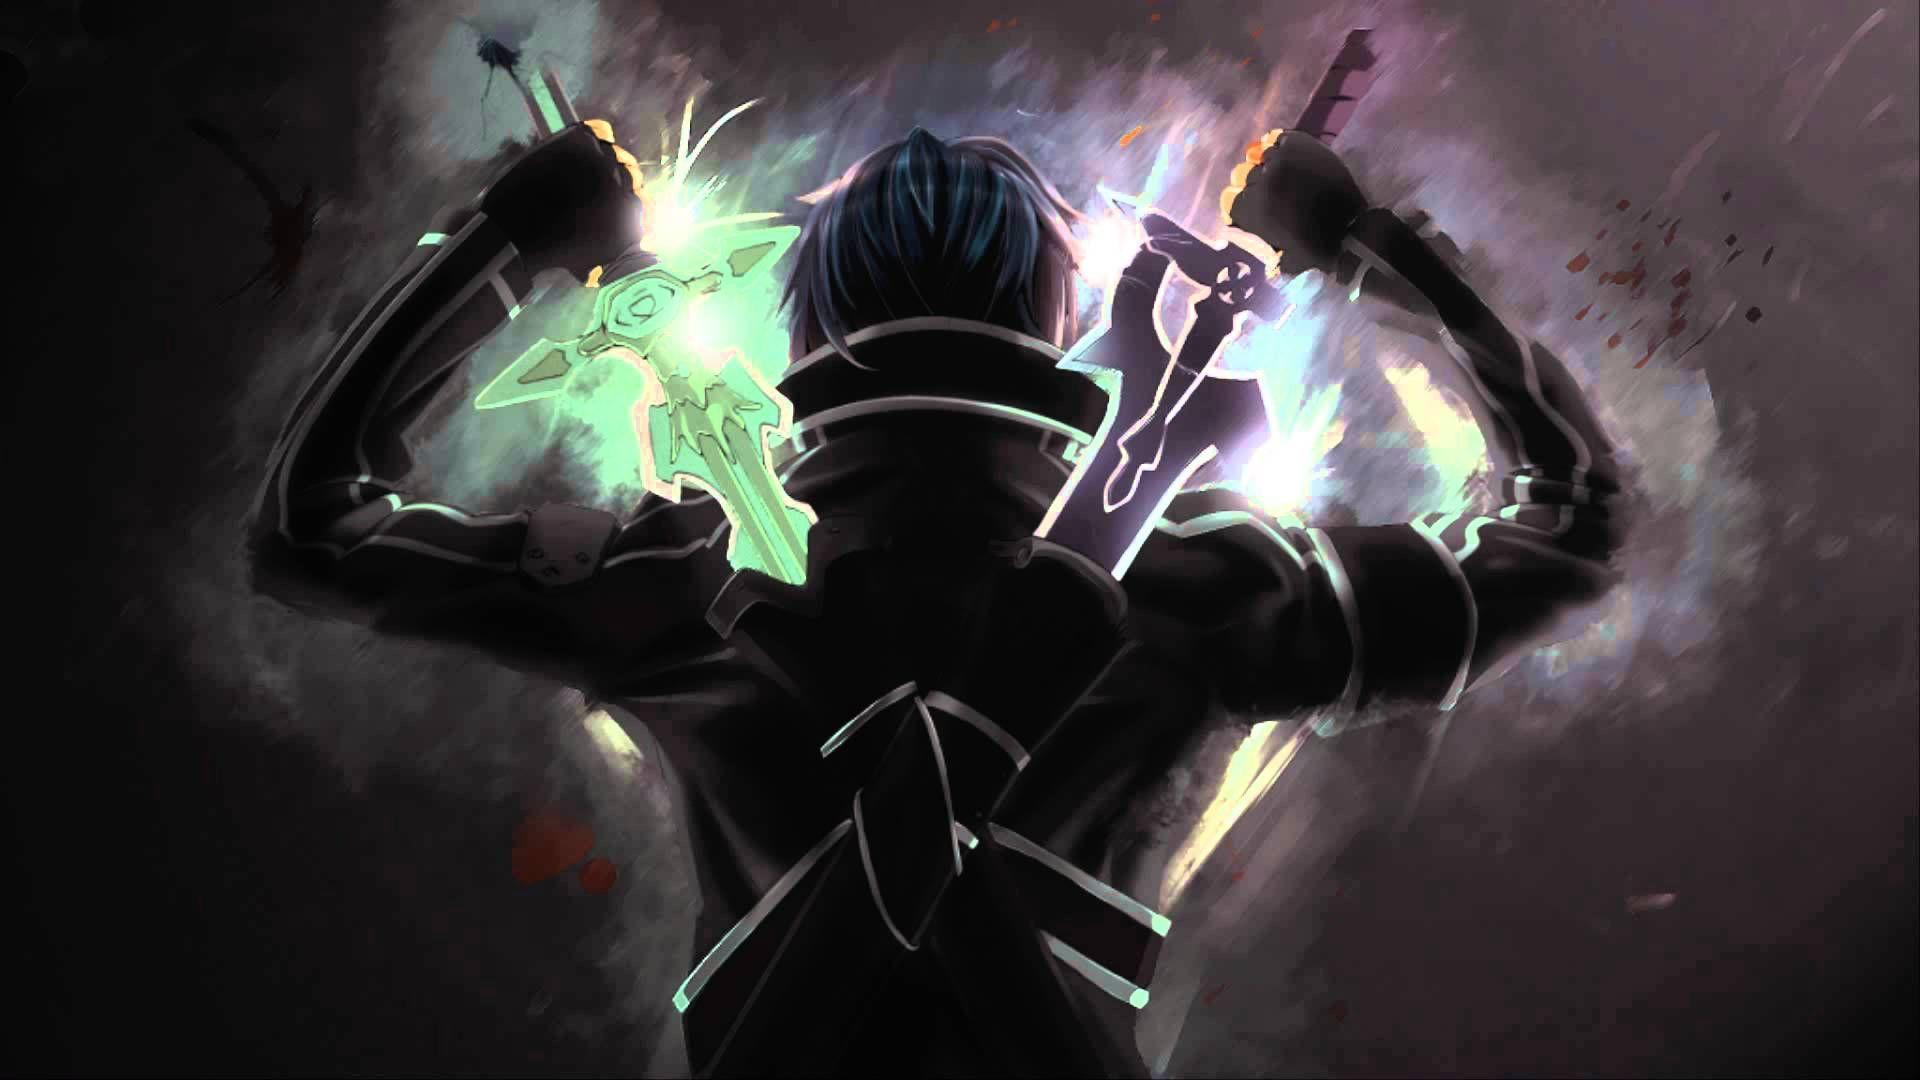 Animated Wallpaper Sword Art Online In 2020 Sword Art Online Wallpaper Sword Art Online Android Wallpaper Anime